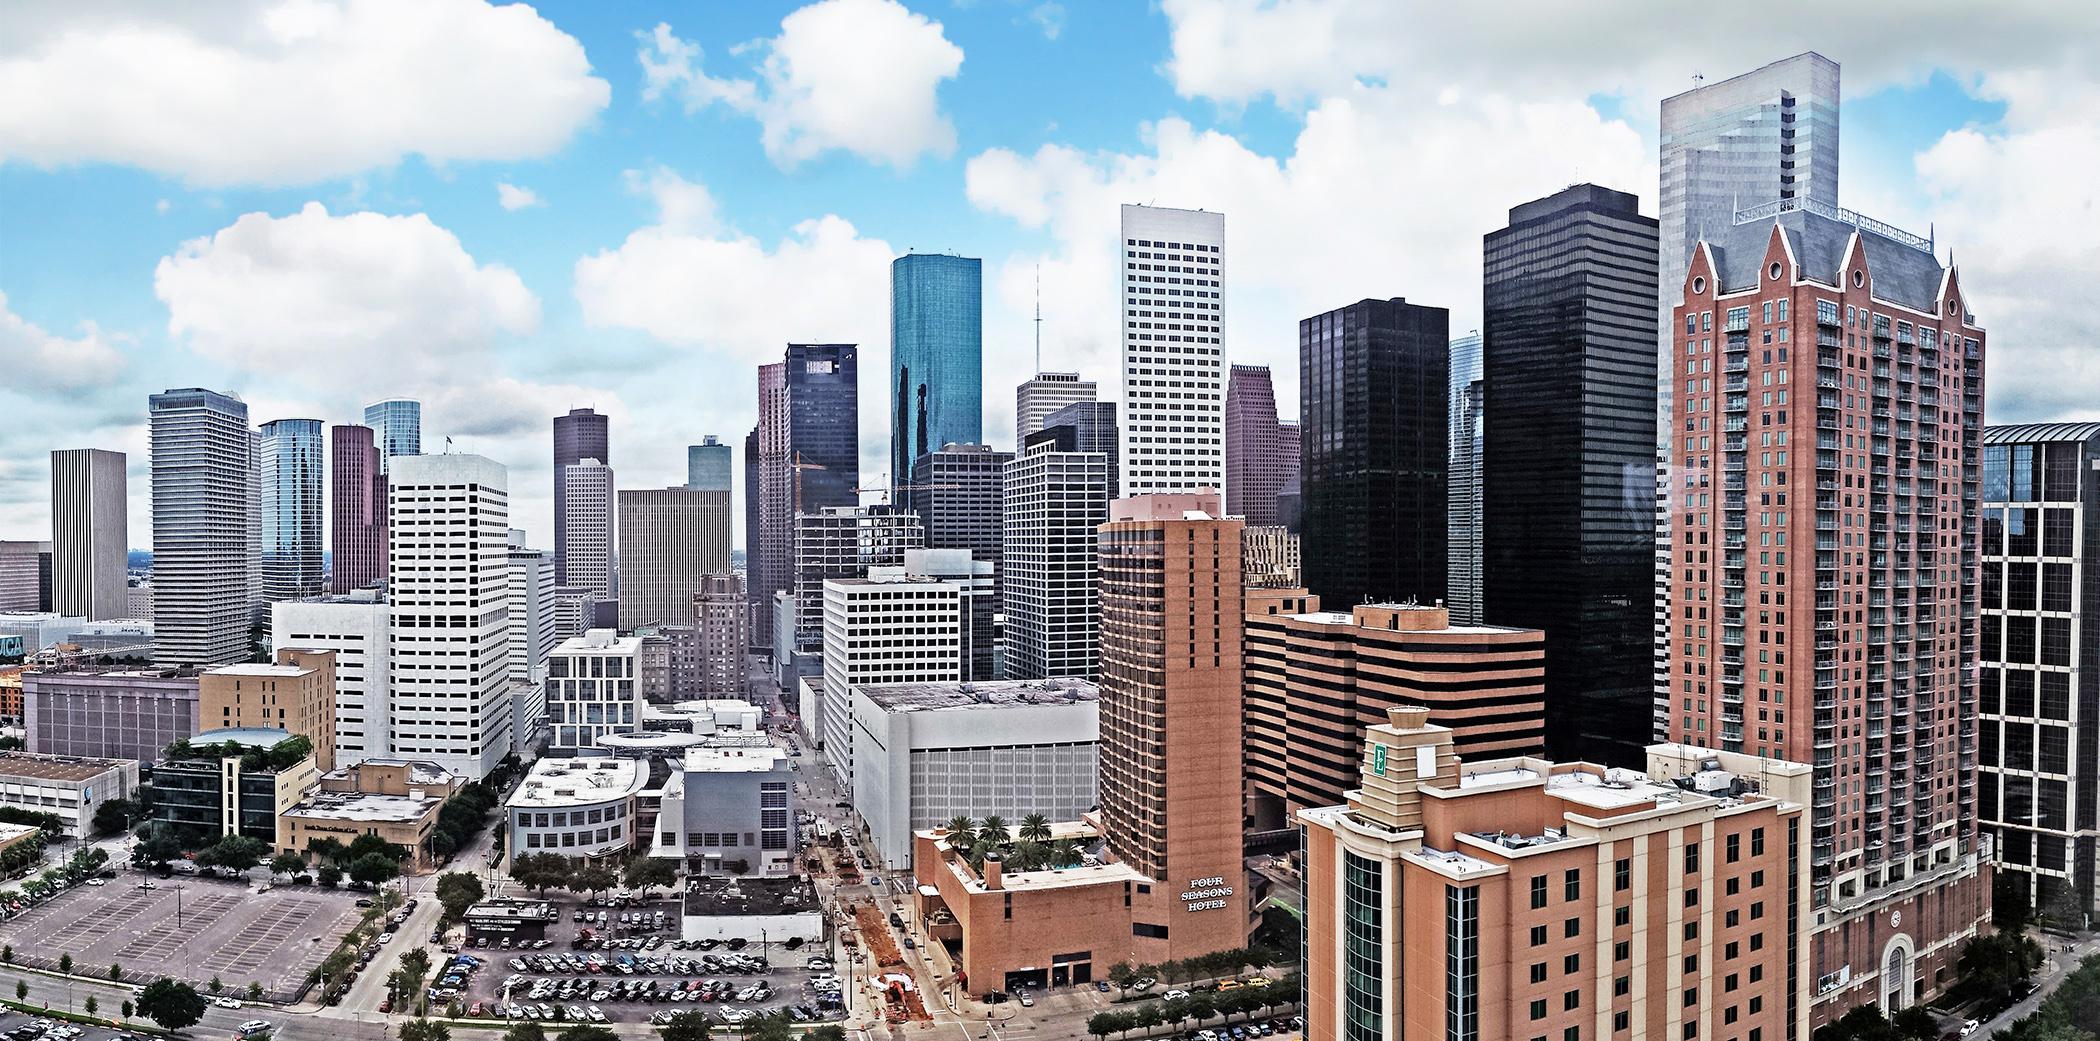 The Top 8 Authentic Restaurants in Houston